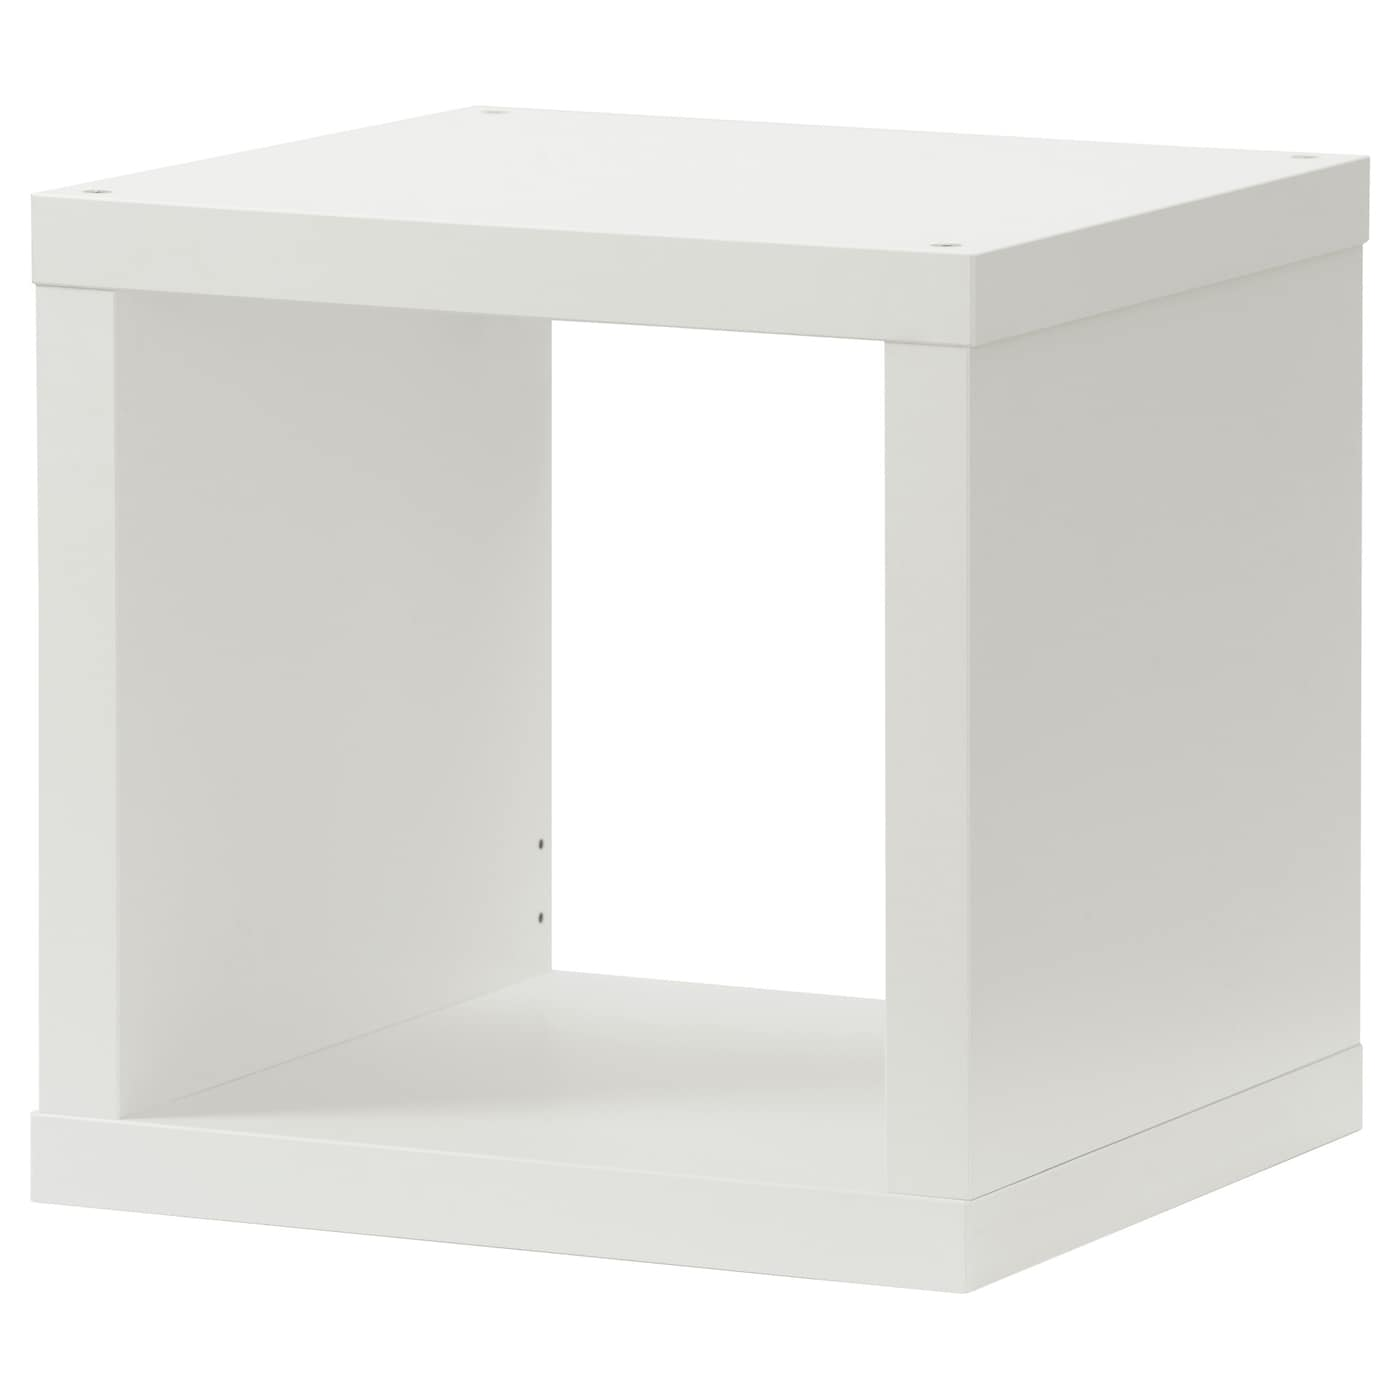 42x42cm Einsatz Cube Bücherregal Aufbewahrung IKEA KALLAX